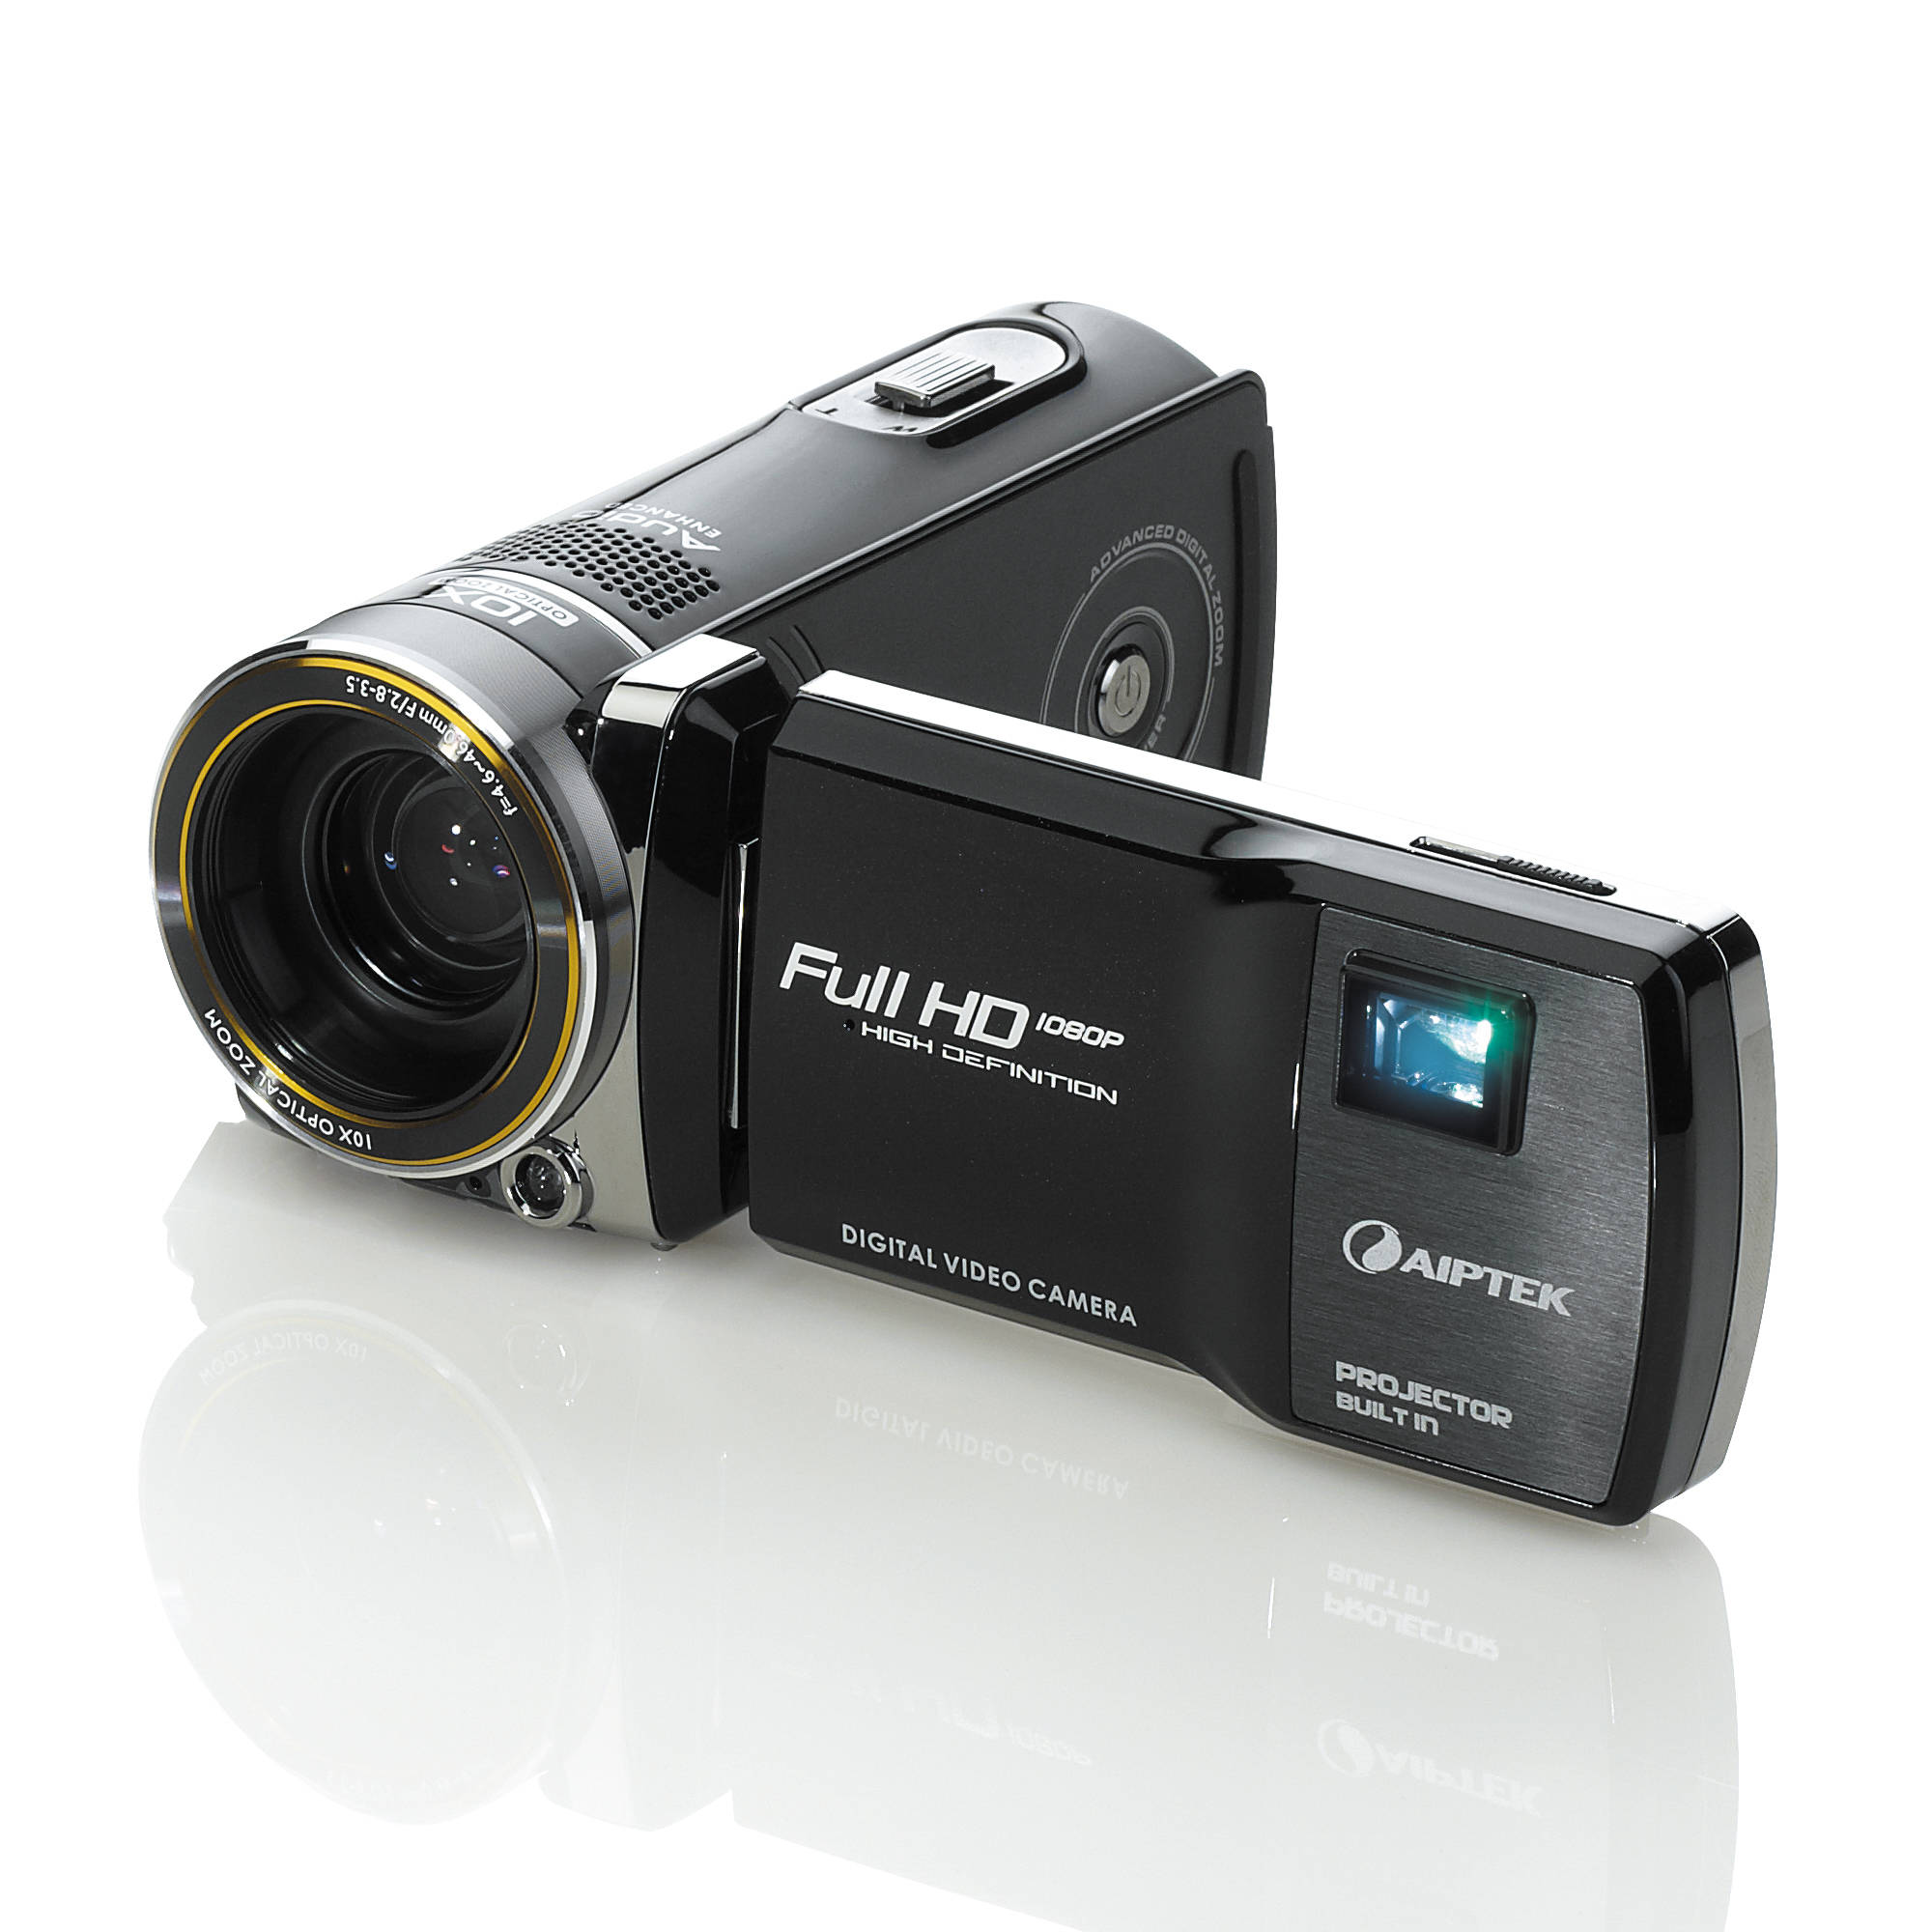 Aiptek projectorcam c25 full hd camcorder projectorcam c25 b h for Hd pico projector